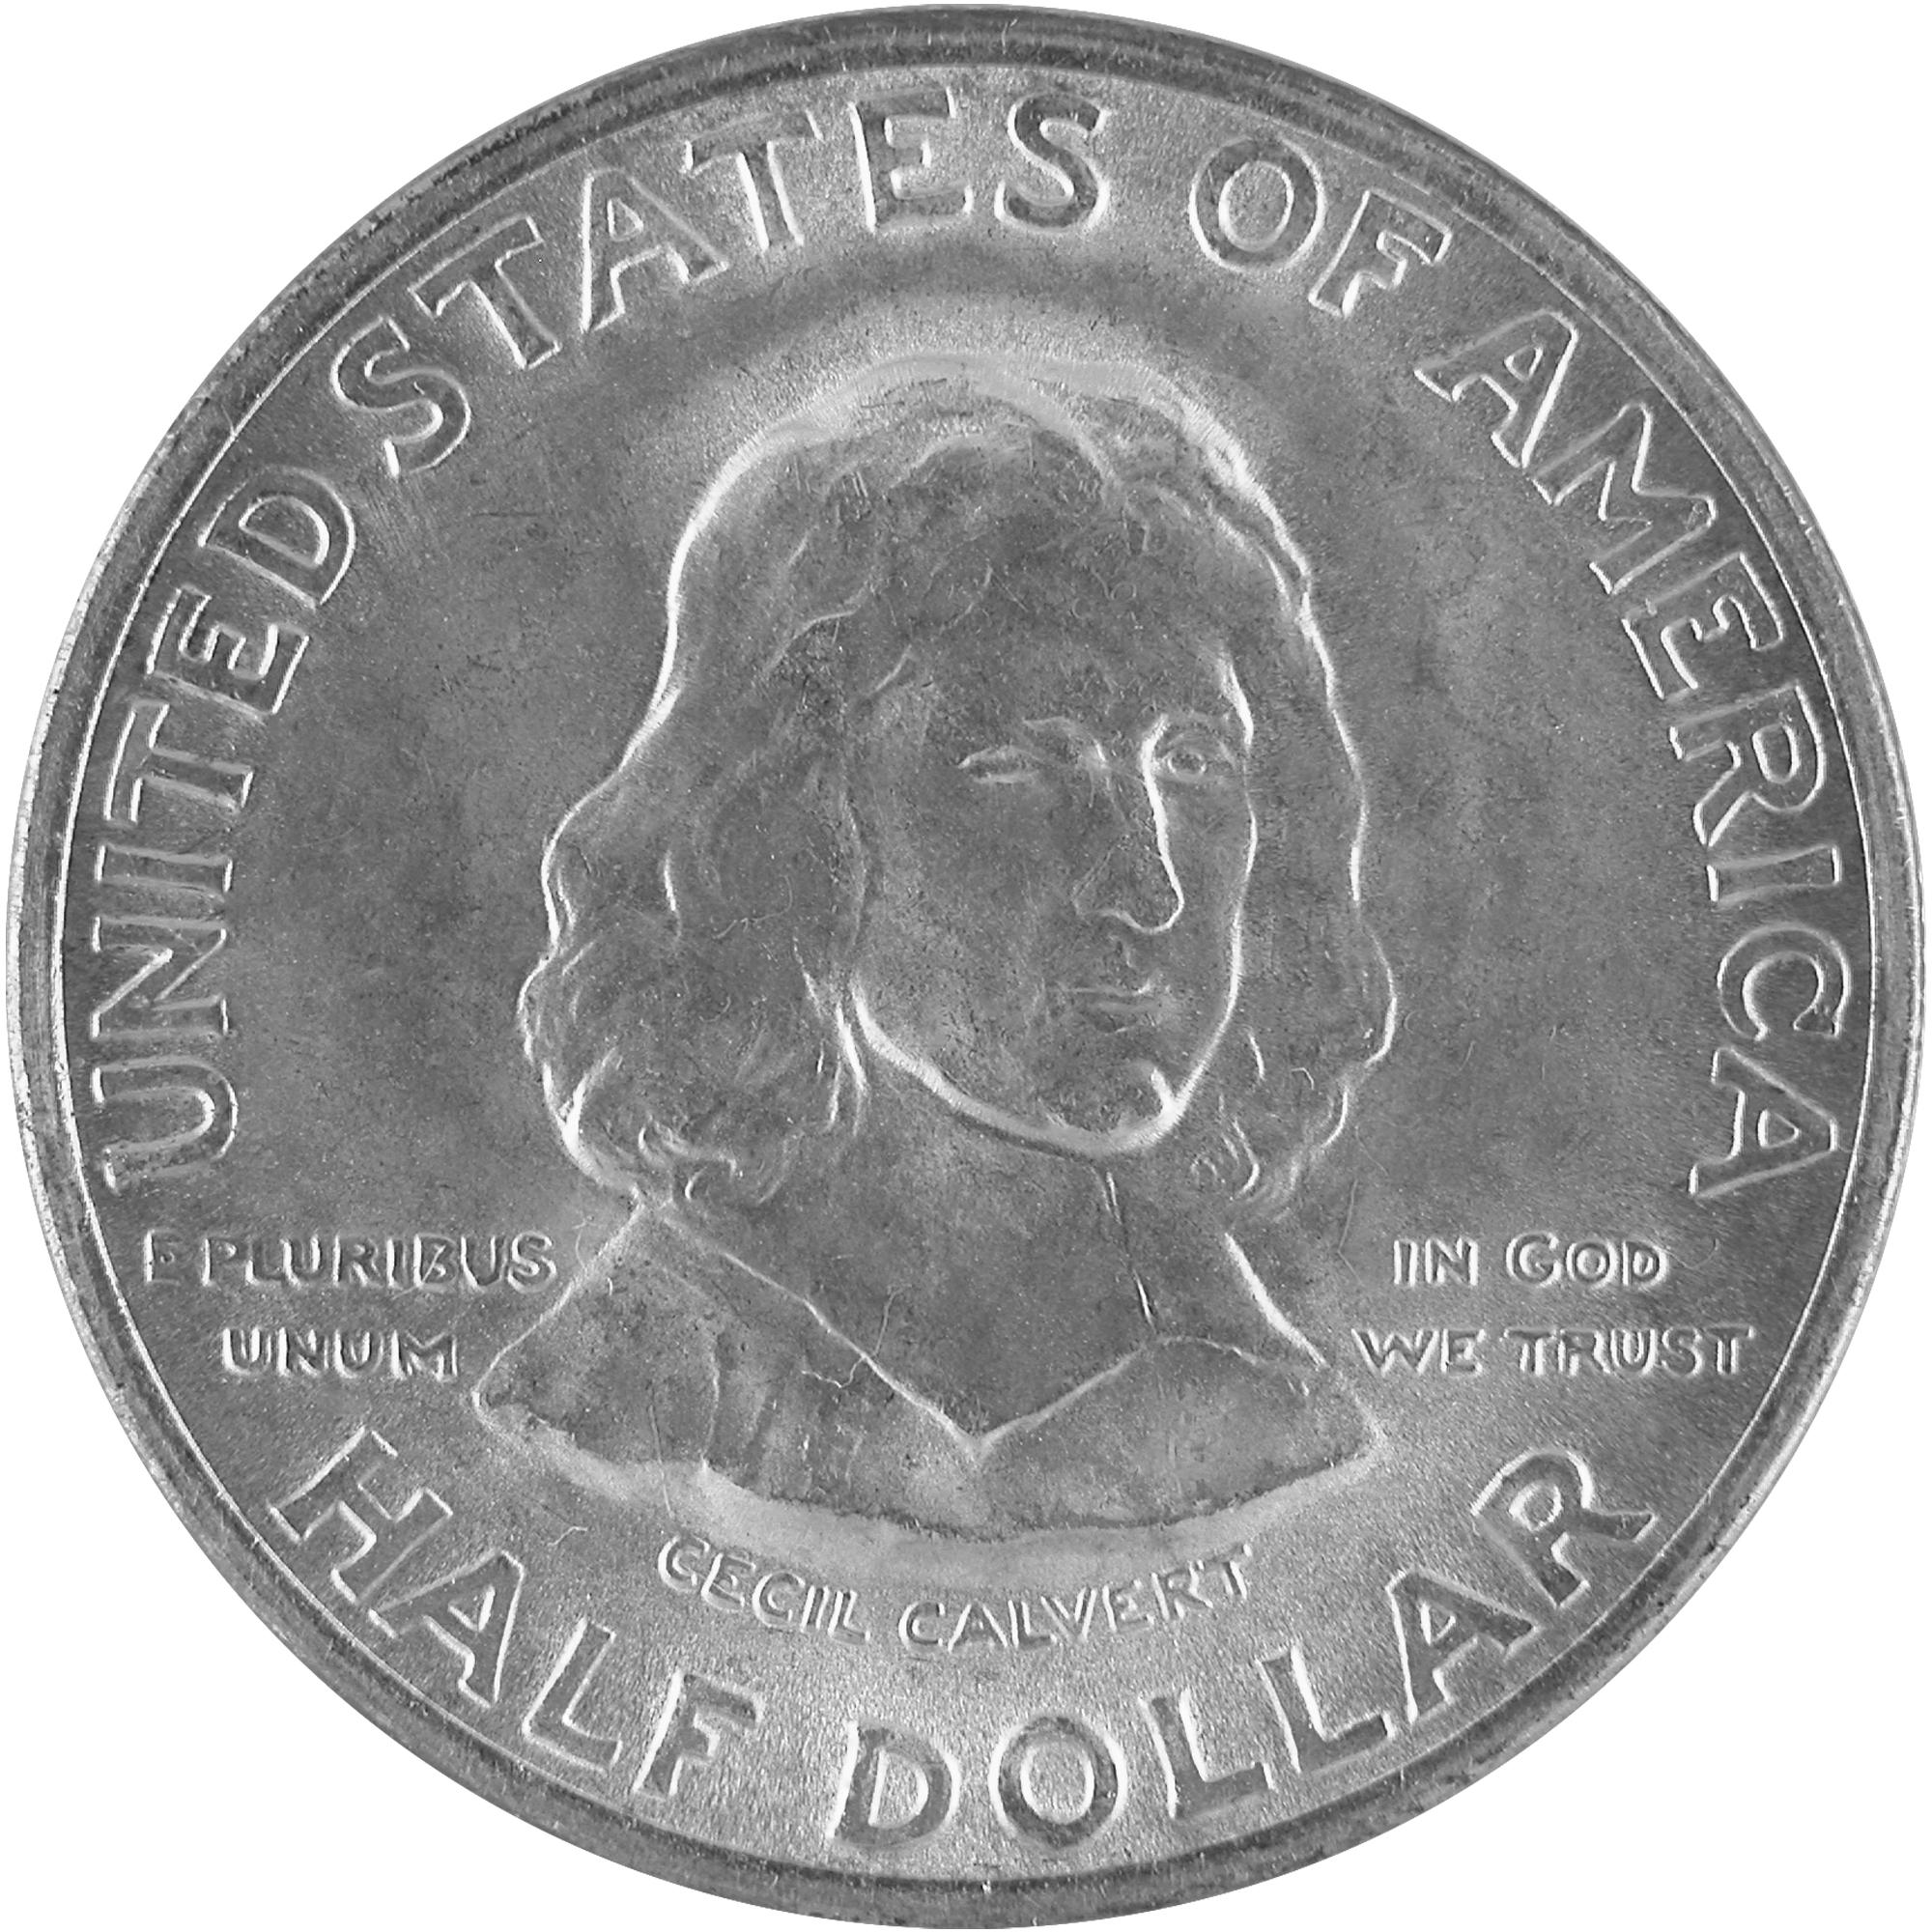 1934 Maryland Tercentenary Commemorative Silver Half Dollar Coin Obverse